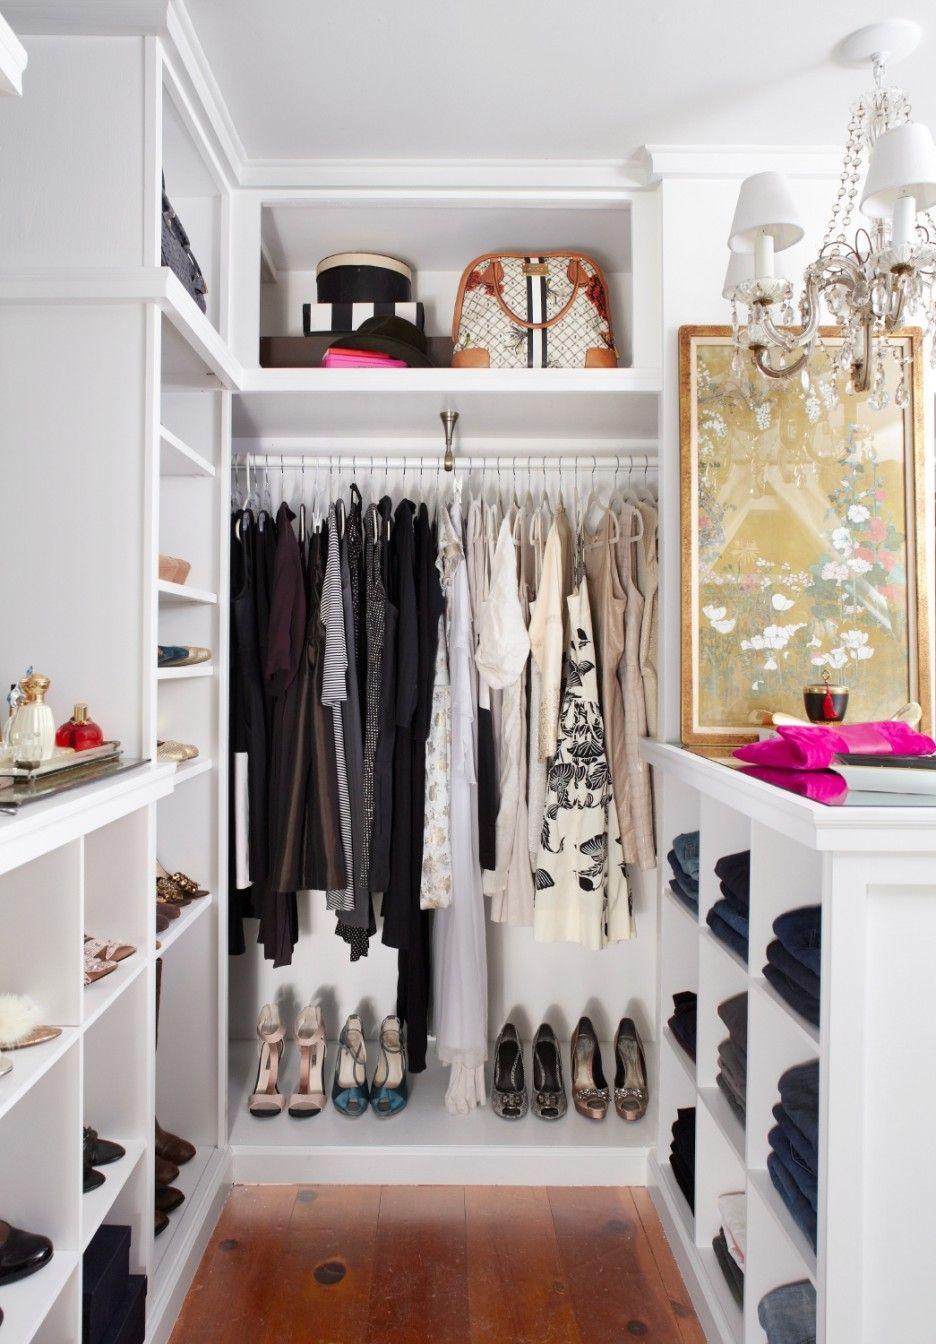 Furniture gorgeous ideas for a small walk in closet design sutton